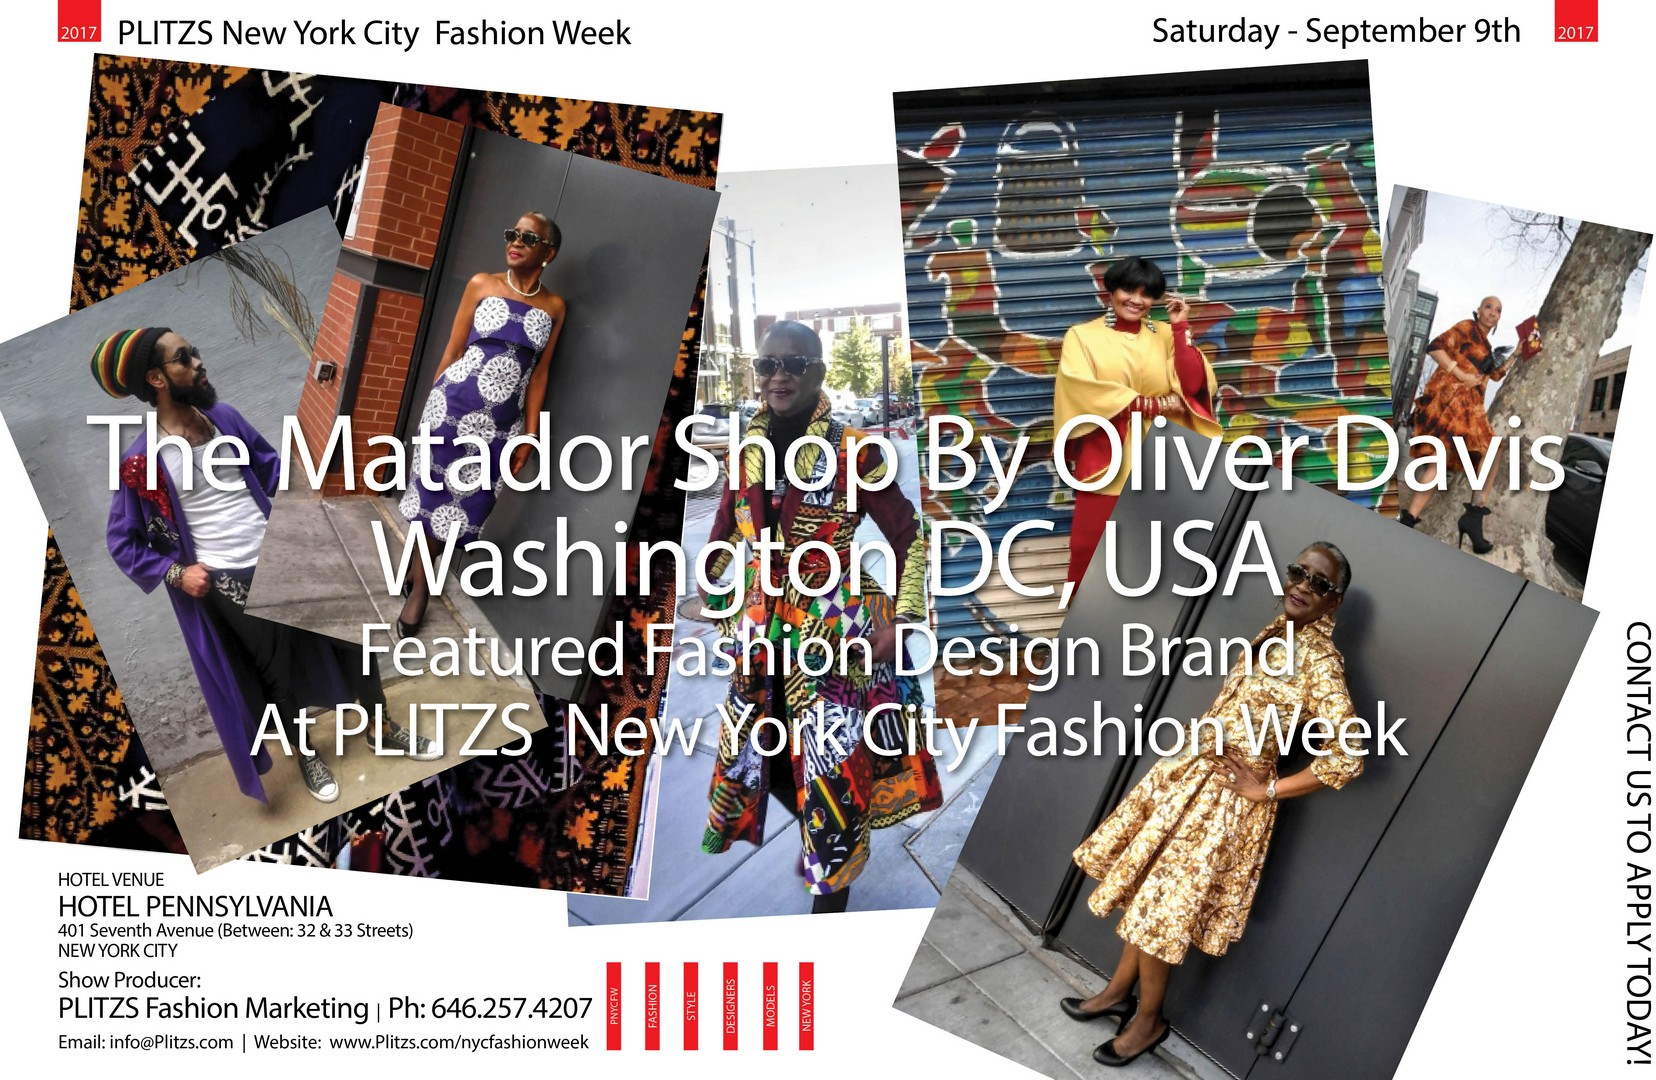 1 00pm The Matador Shop By Oliver Davis Washington Dc Usa Plitzs New York City Fashion Week